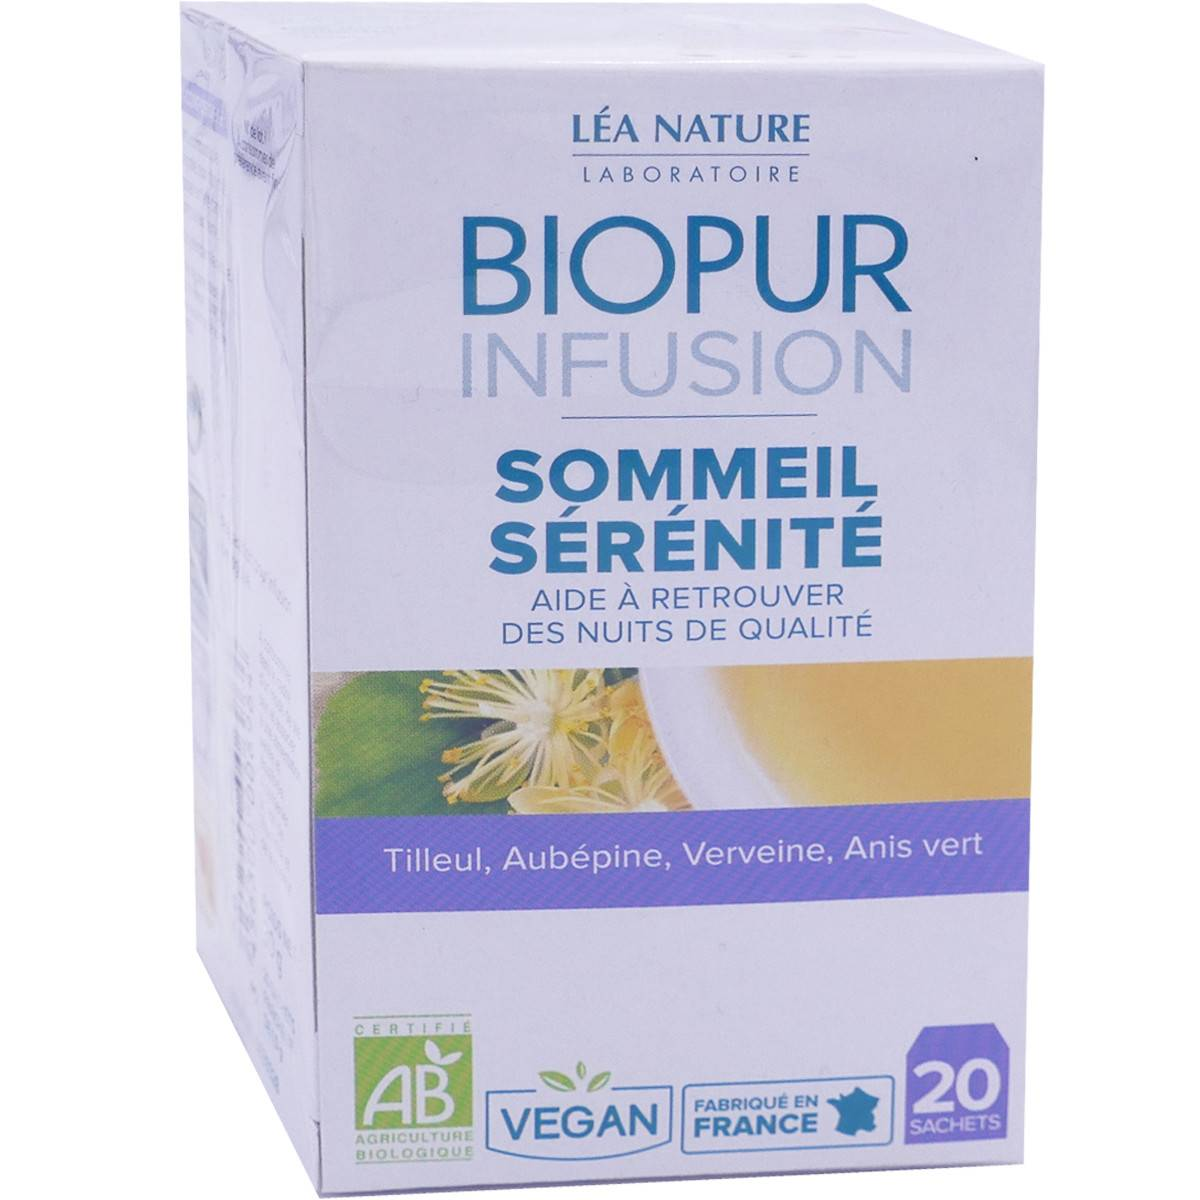 LEA NATURE Biopur infusion sommeil serenite 20 sachets bio